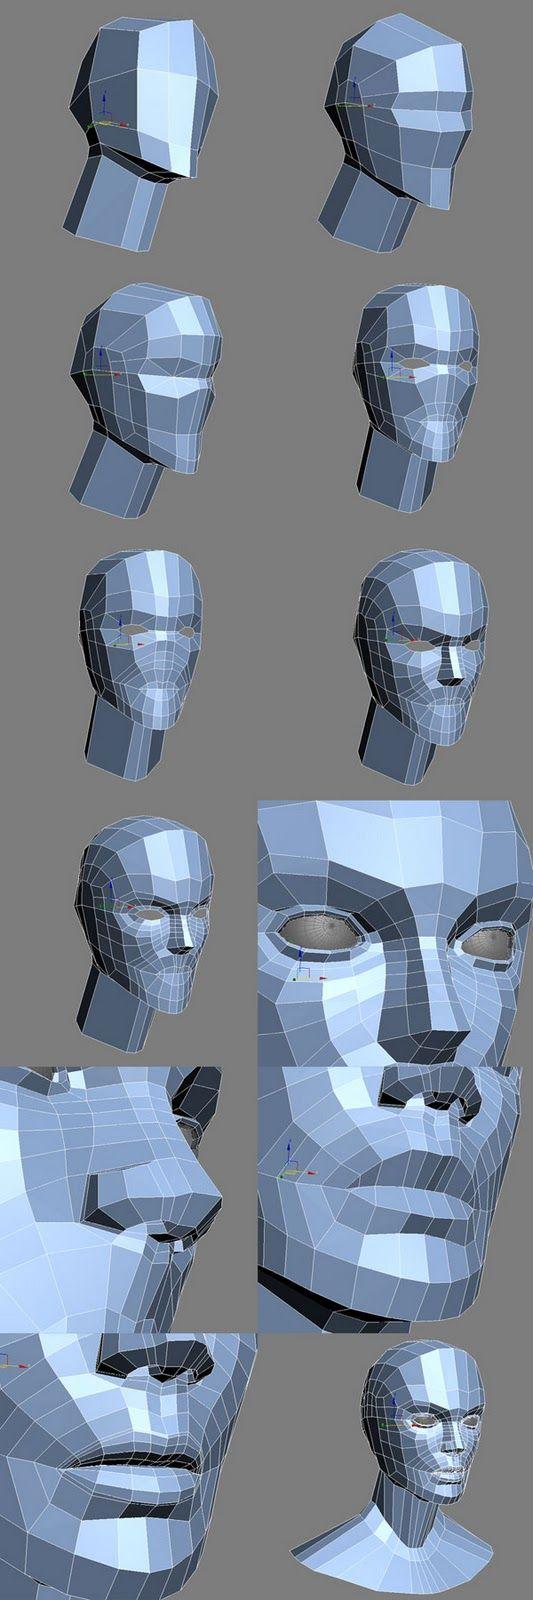 Head_Guideline.jpg 533×1,600 pixels